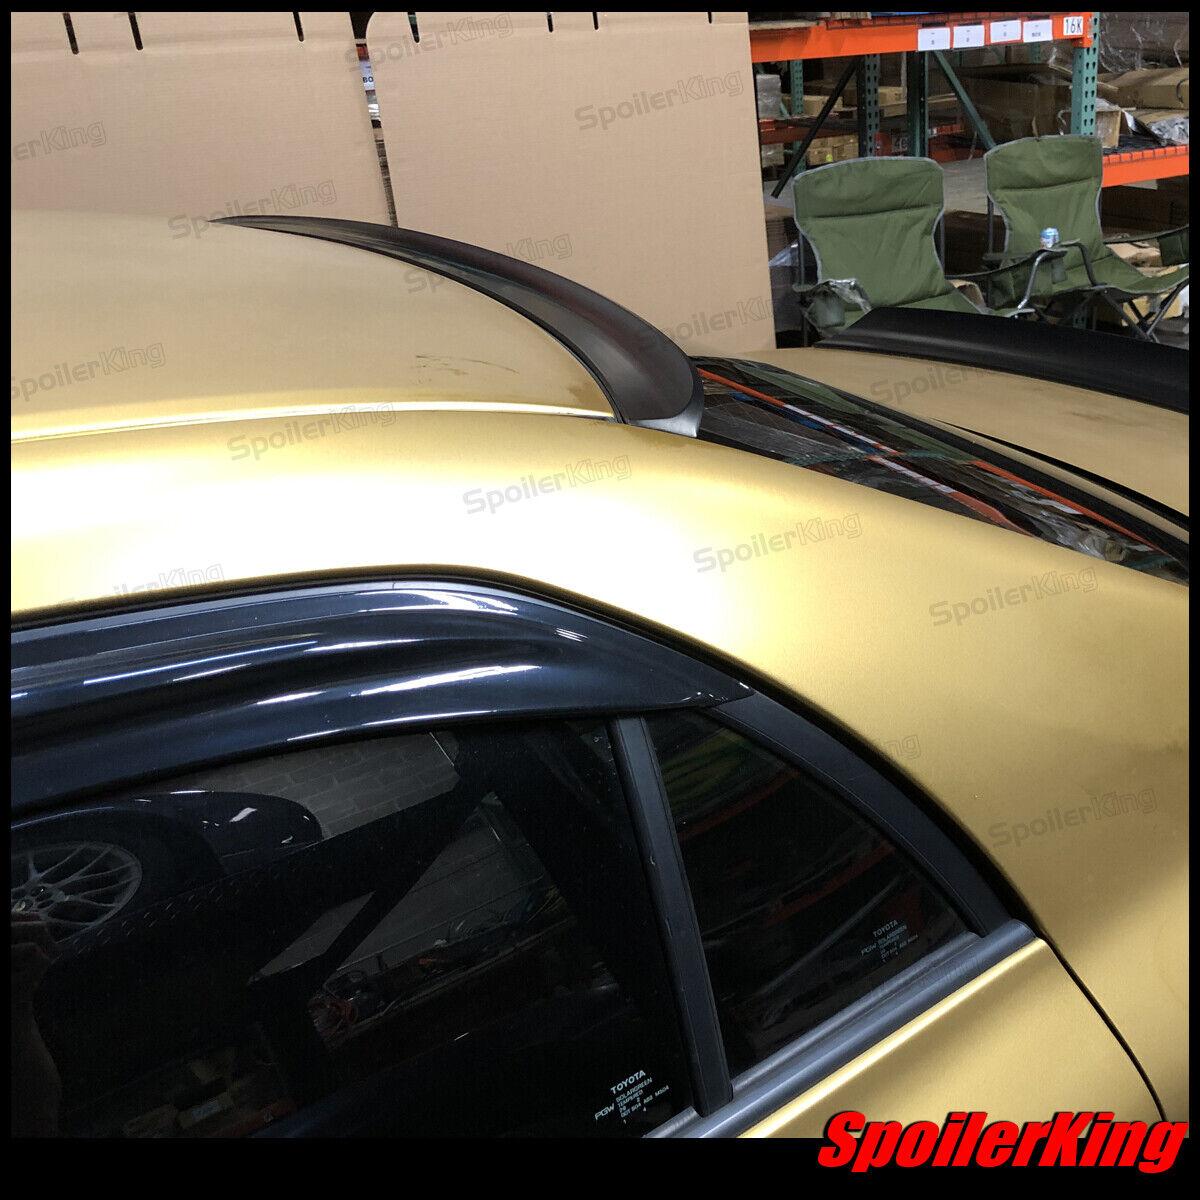 Toyota Corolla 2011-2013 Rear Window Roof Spoiler Polyurethane Wing 284R